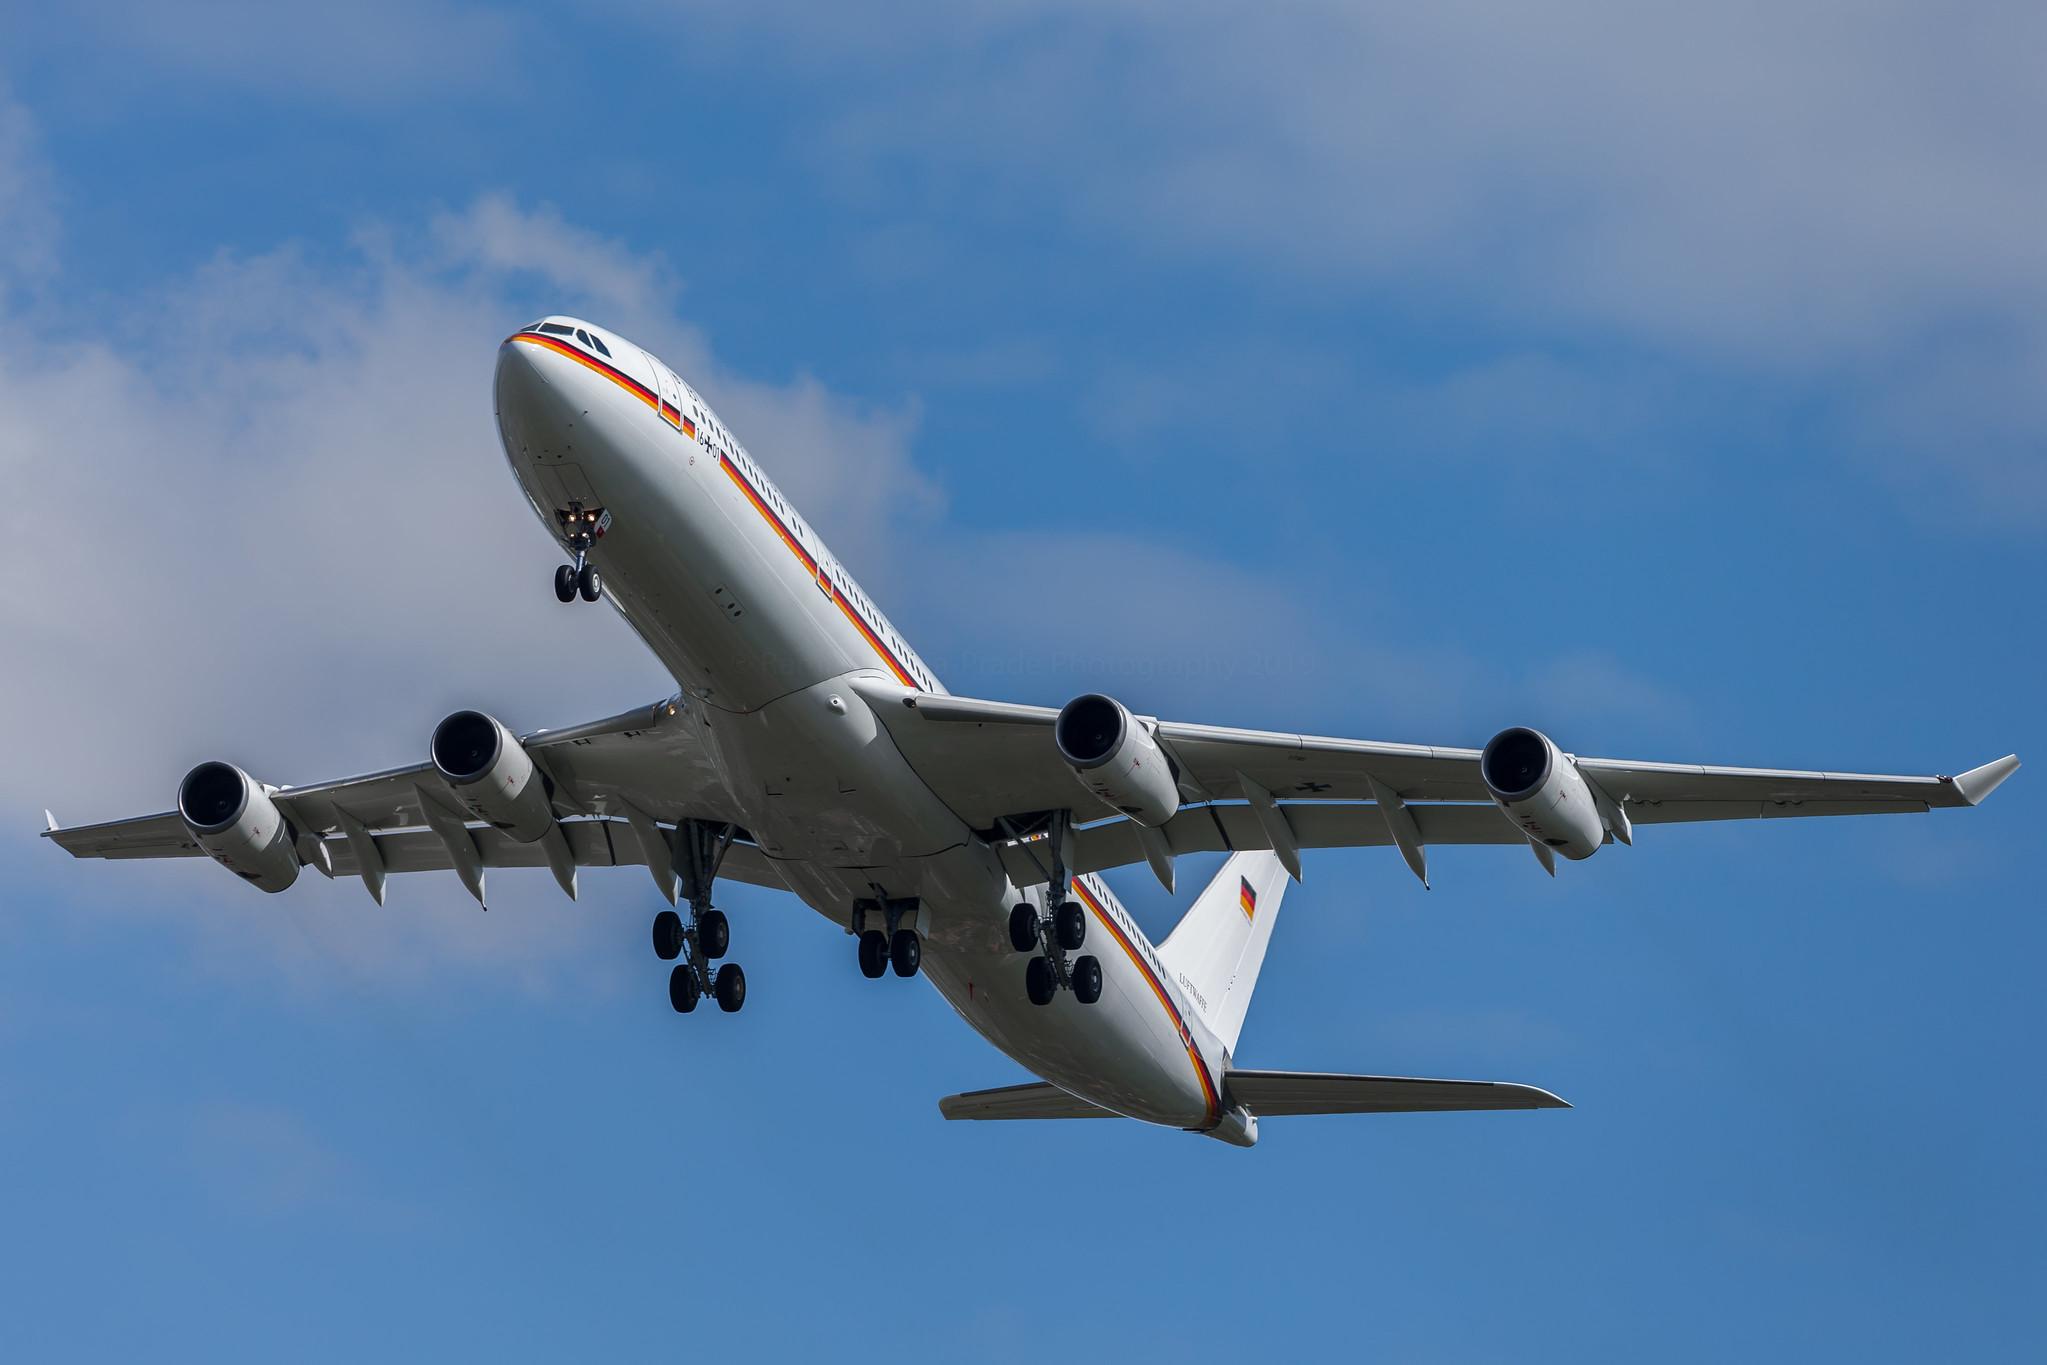 A340-300 « Konrad-Adenauer » Luftwaff